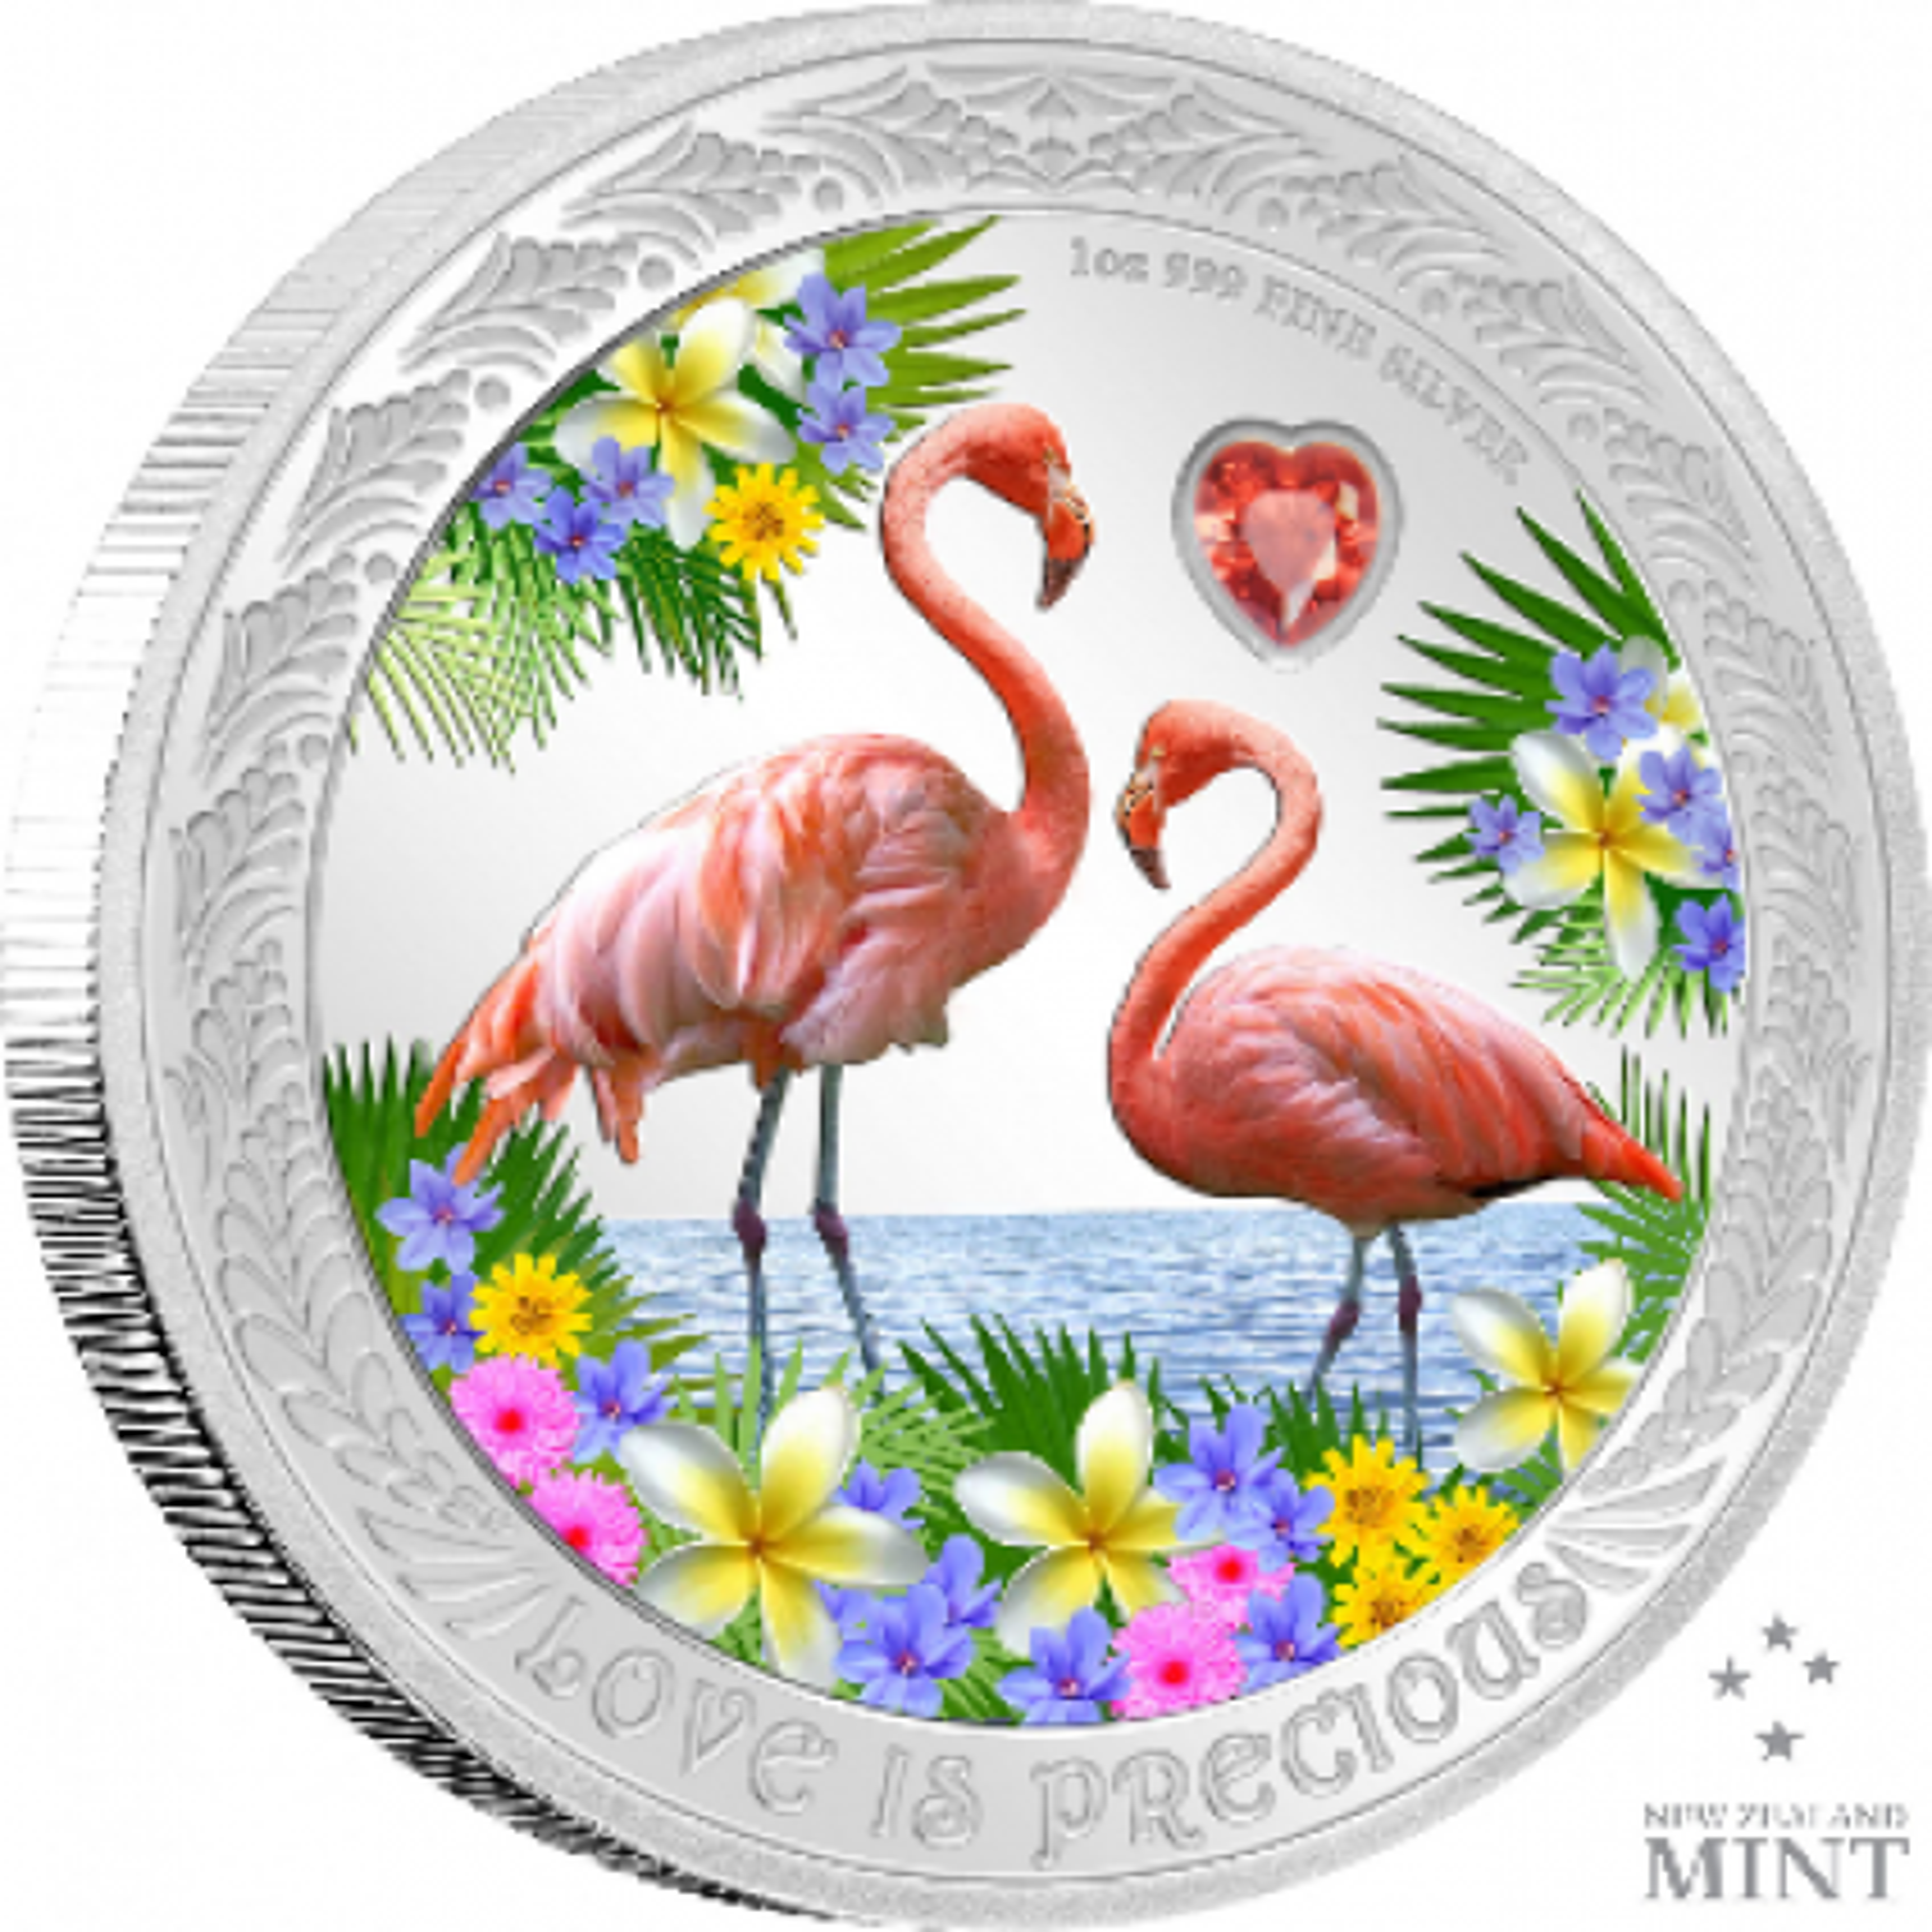 1 troy ounce zilveren munt Love is Precious - Flamingo's 2021